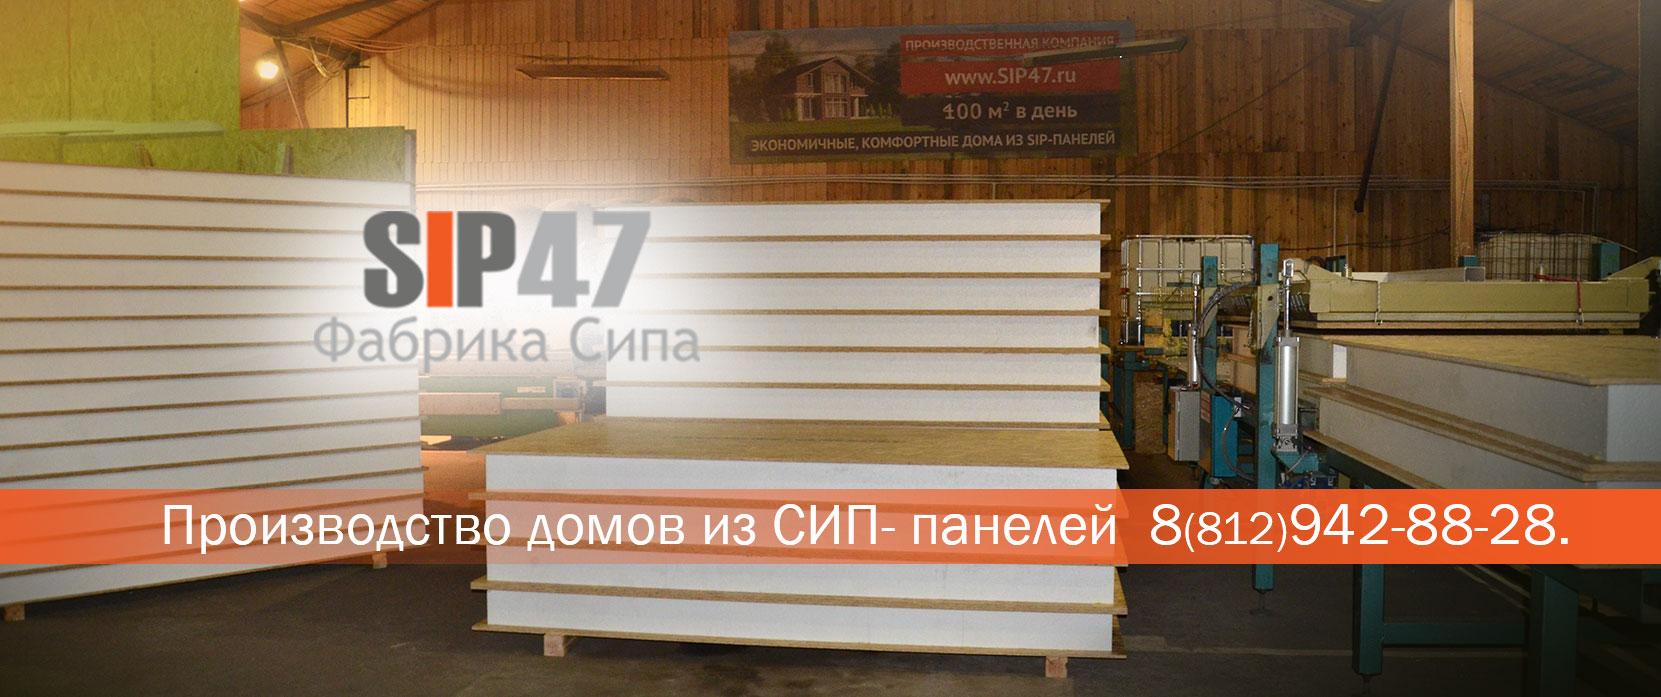 Производство СИП панелей Гатчина